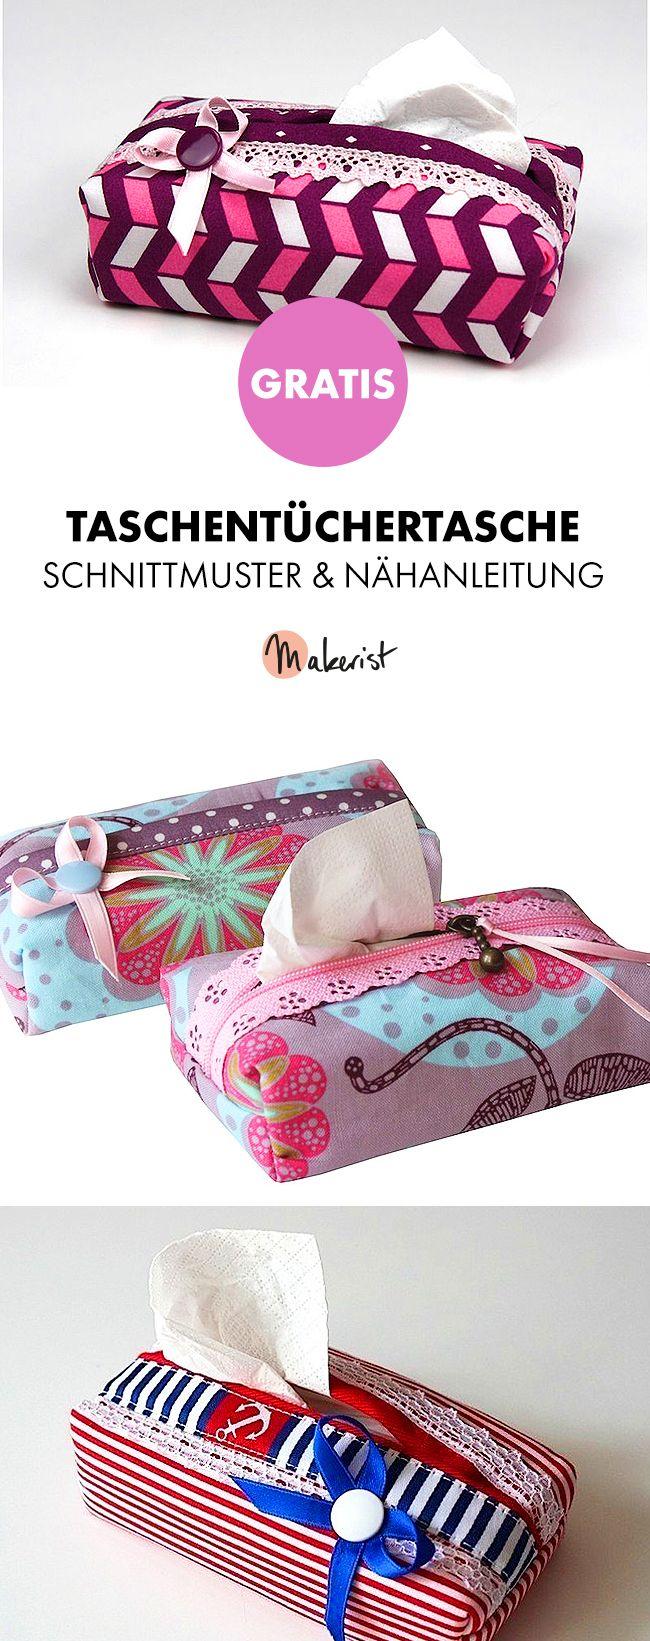 Gratis Anleitung: Taschentücher-Box selber nähen - Schnittmuster und ...